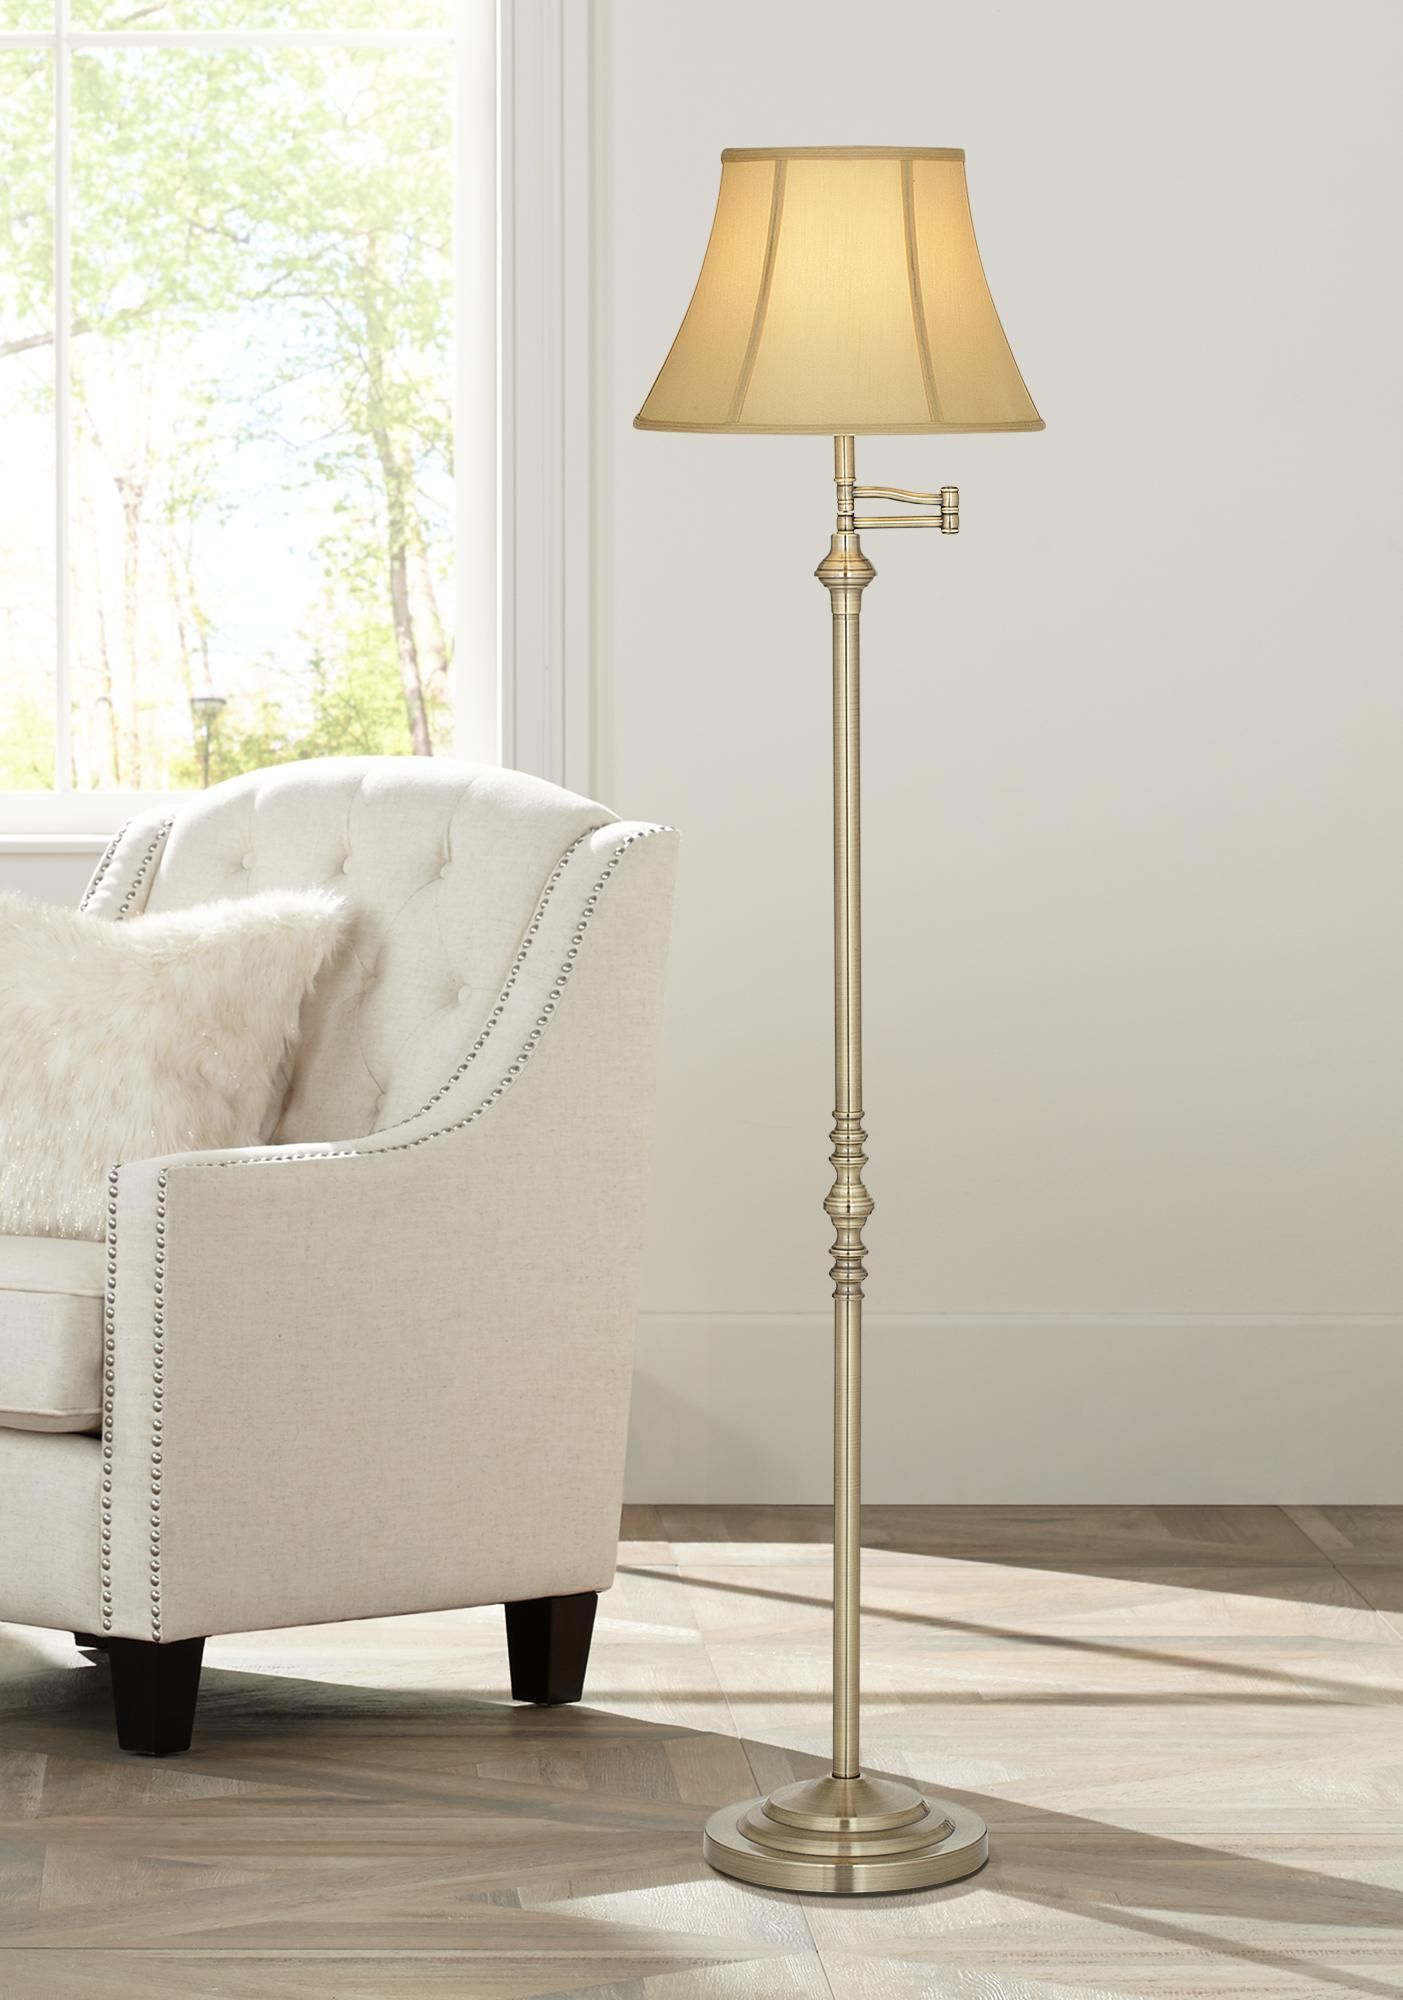 Floor Lamps Montebello Collection Antique Brass Swing Arm Floor Lamp Traditional Floor Lamps Floor Lamp Styles Brass Floor Lamp